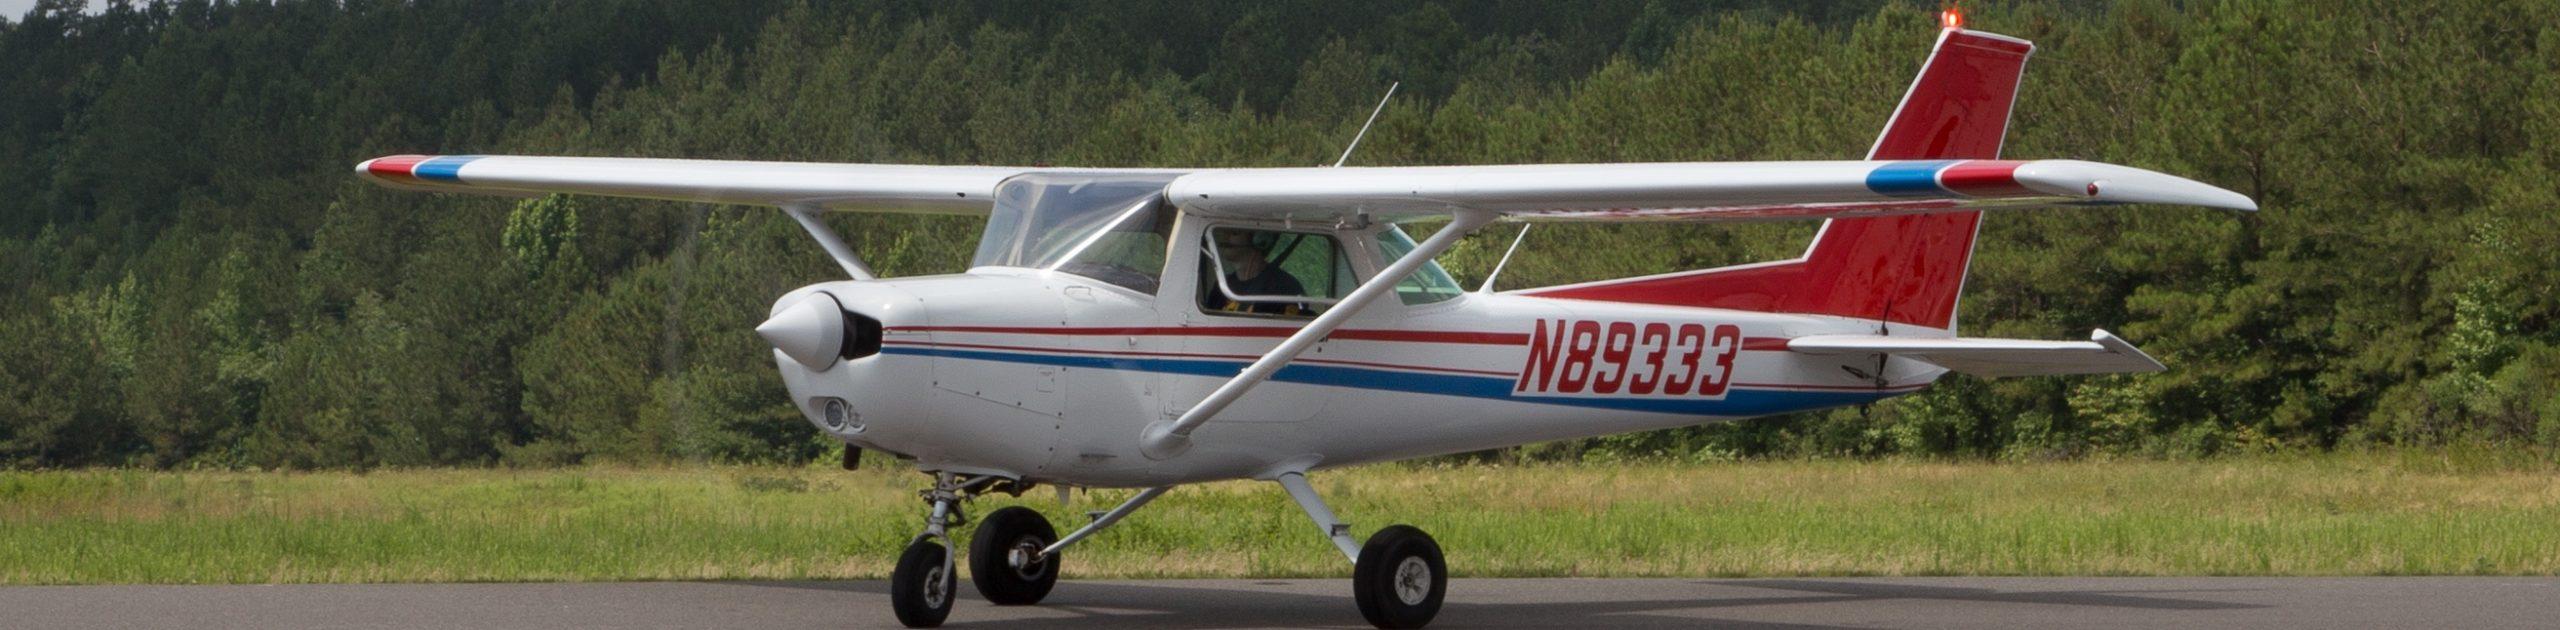 Wings of Carolina Flying Club, at Raleigh Executive Jetport @ Sanford-Lee County